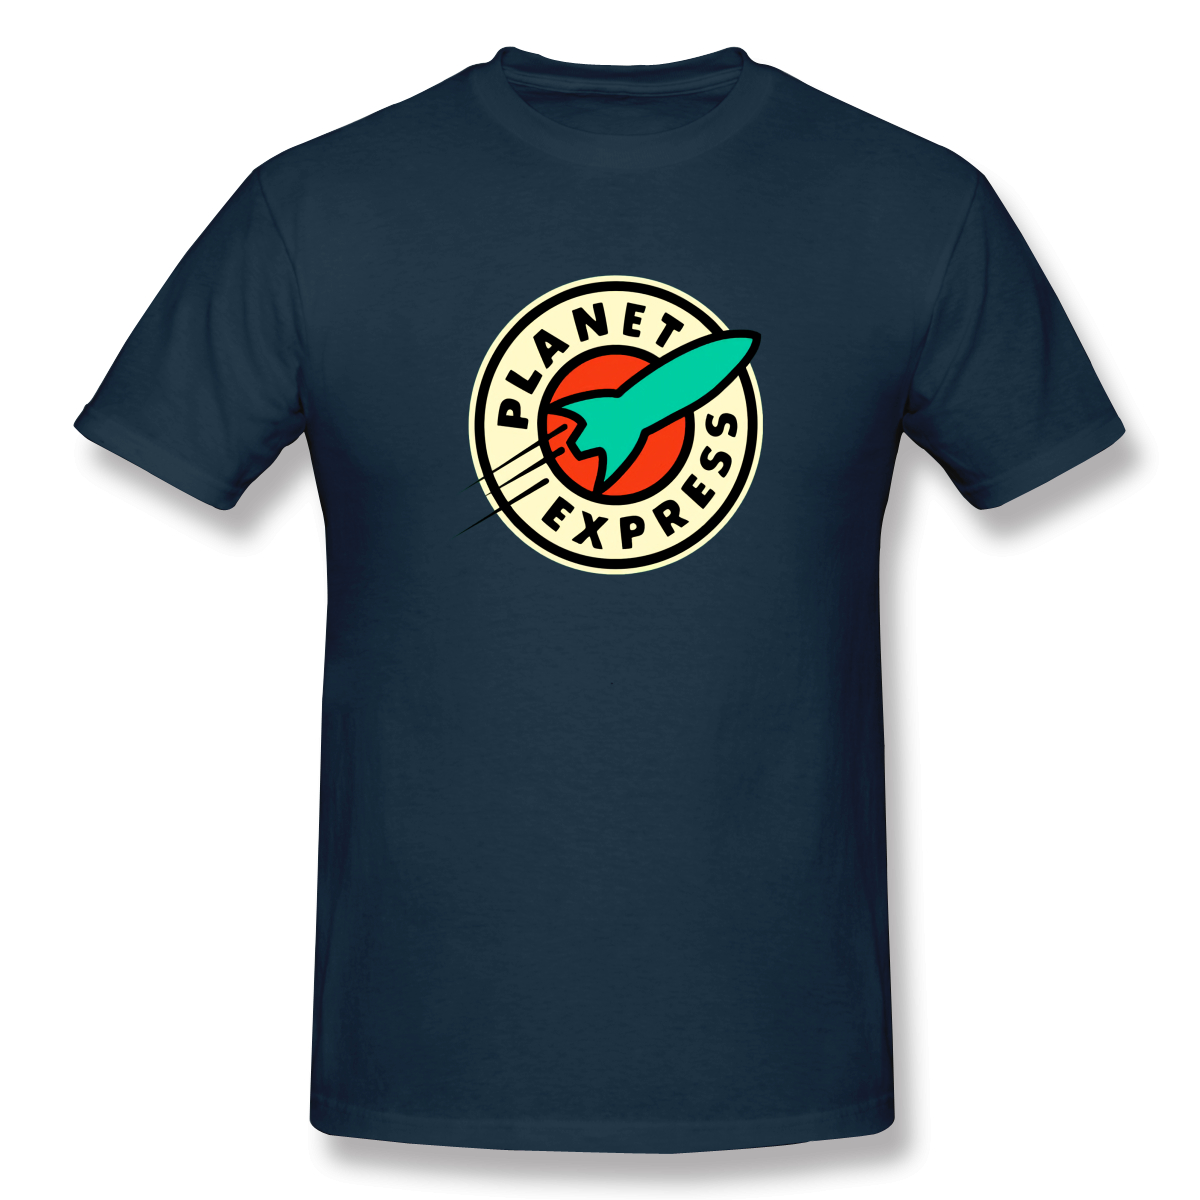 Planet Expres Future Men's Basic Short Sleeve T-Shirt European Size